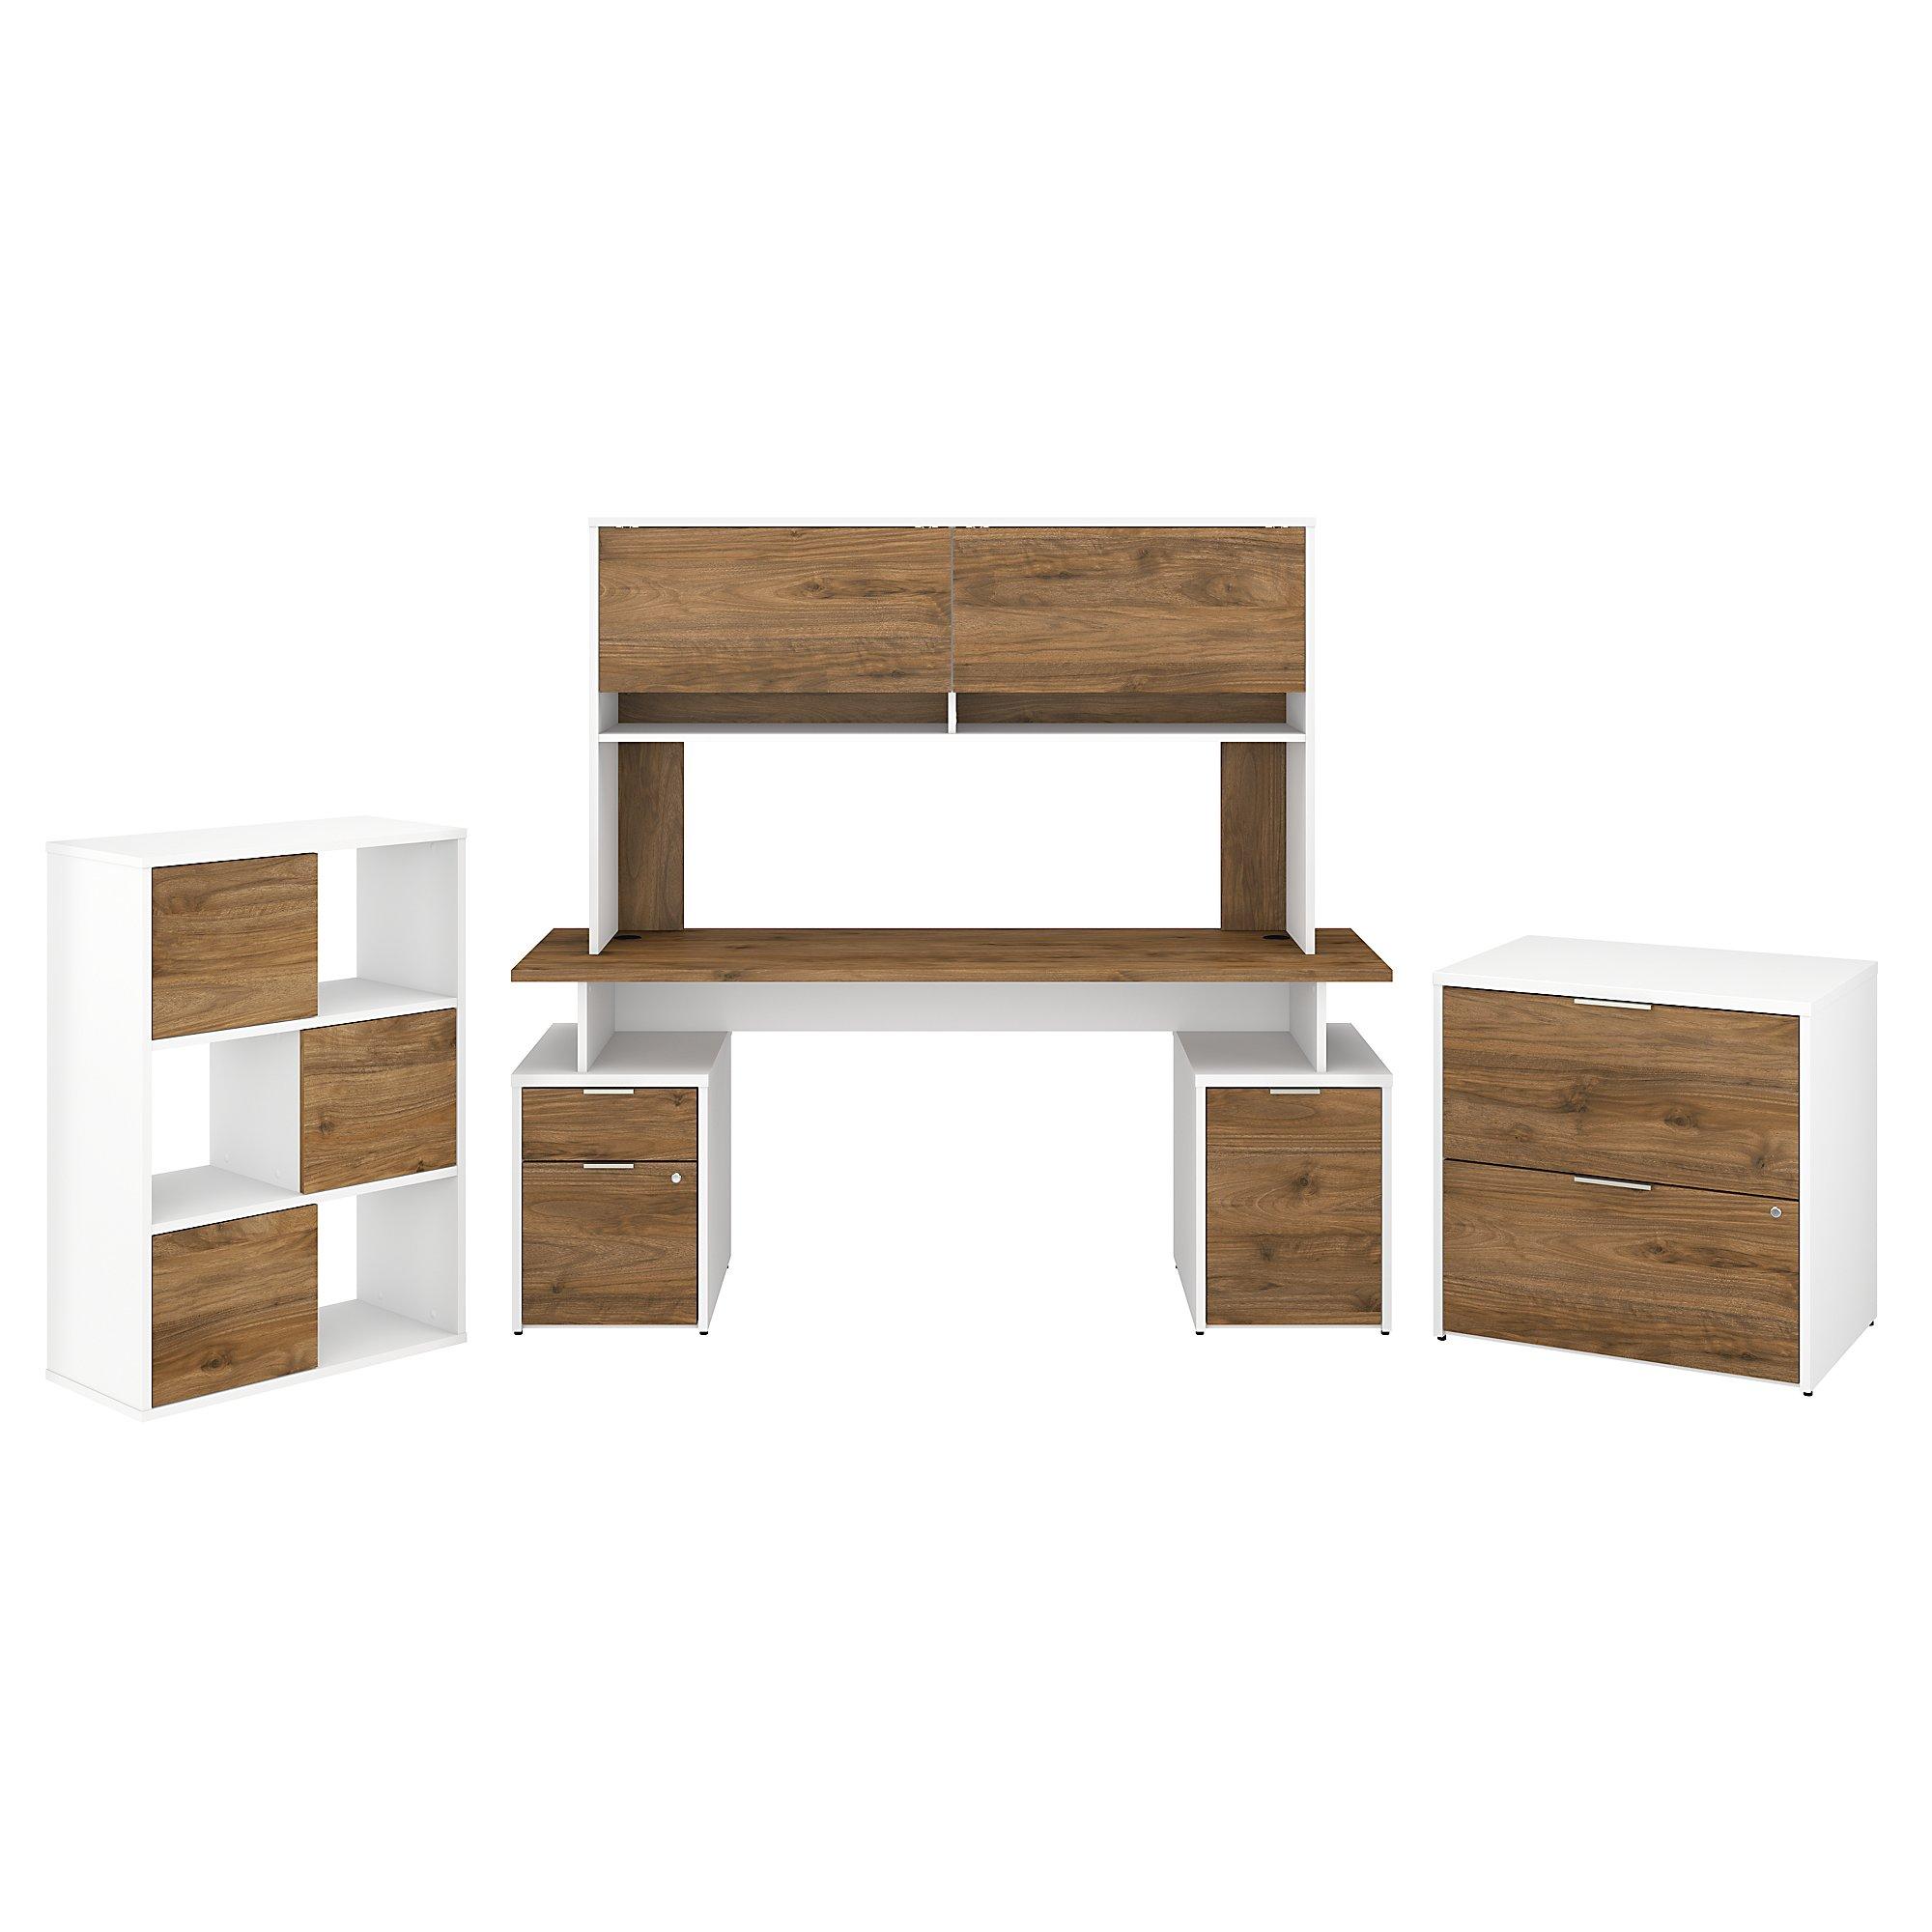 jtn008 walnut and white jamestown desk set